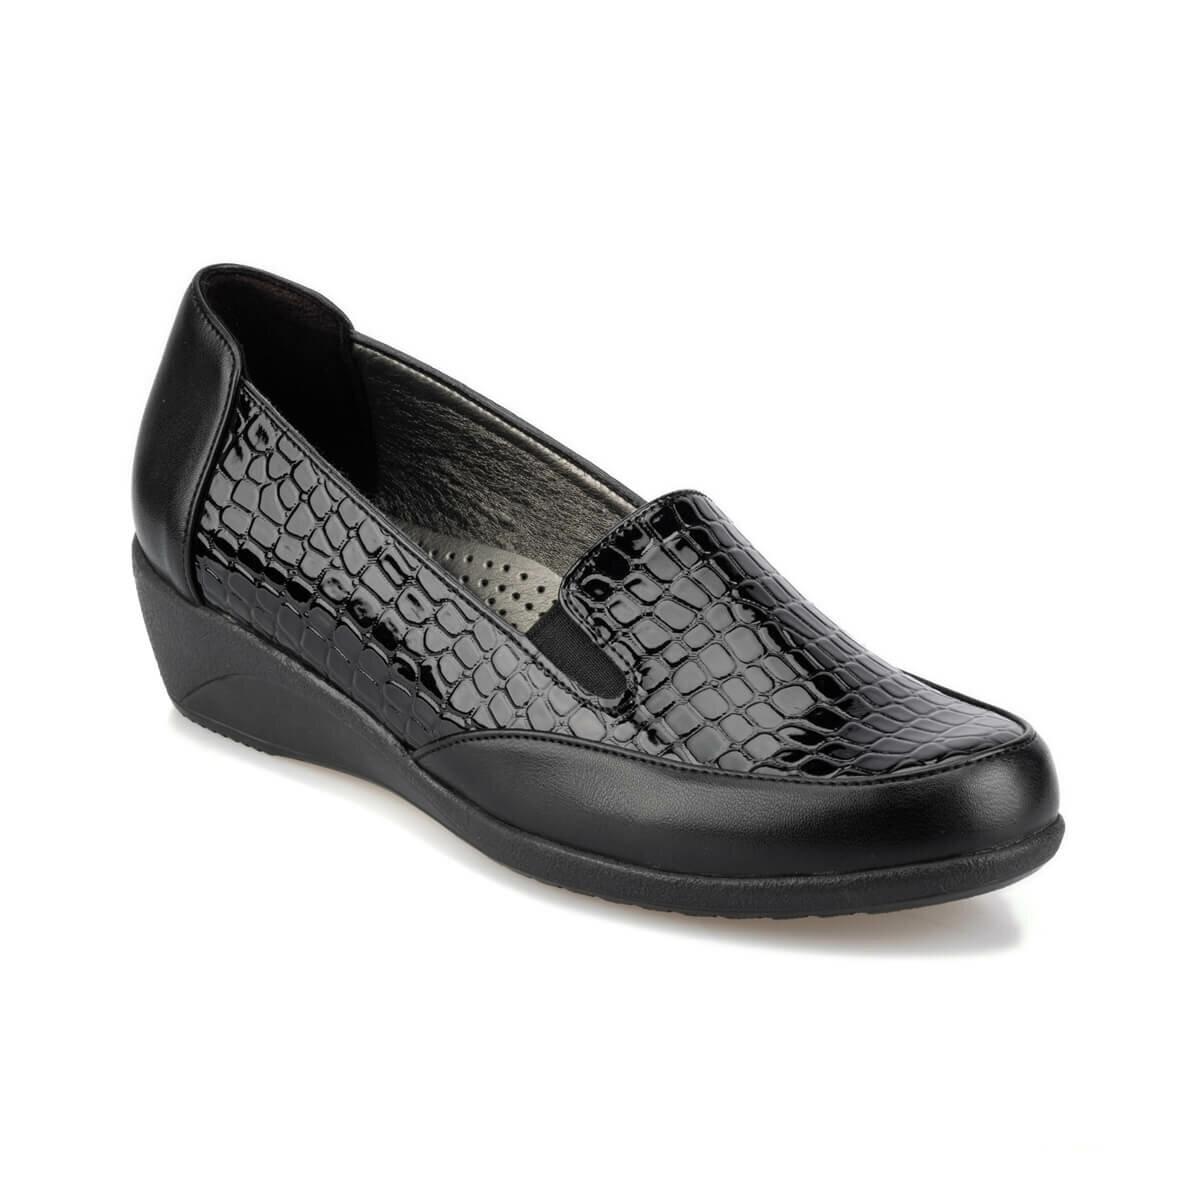 FLO 92.150022RZ Black Women 'S Wedges Shoes Polaris